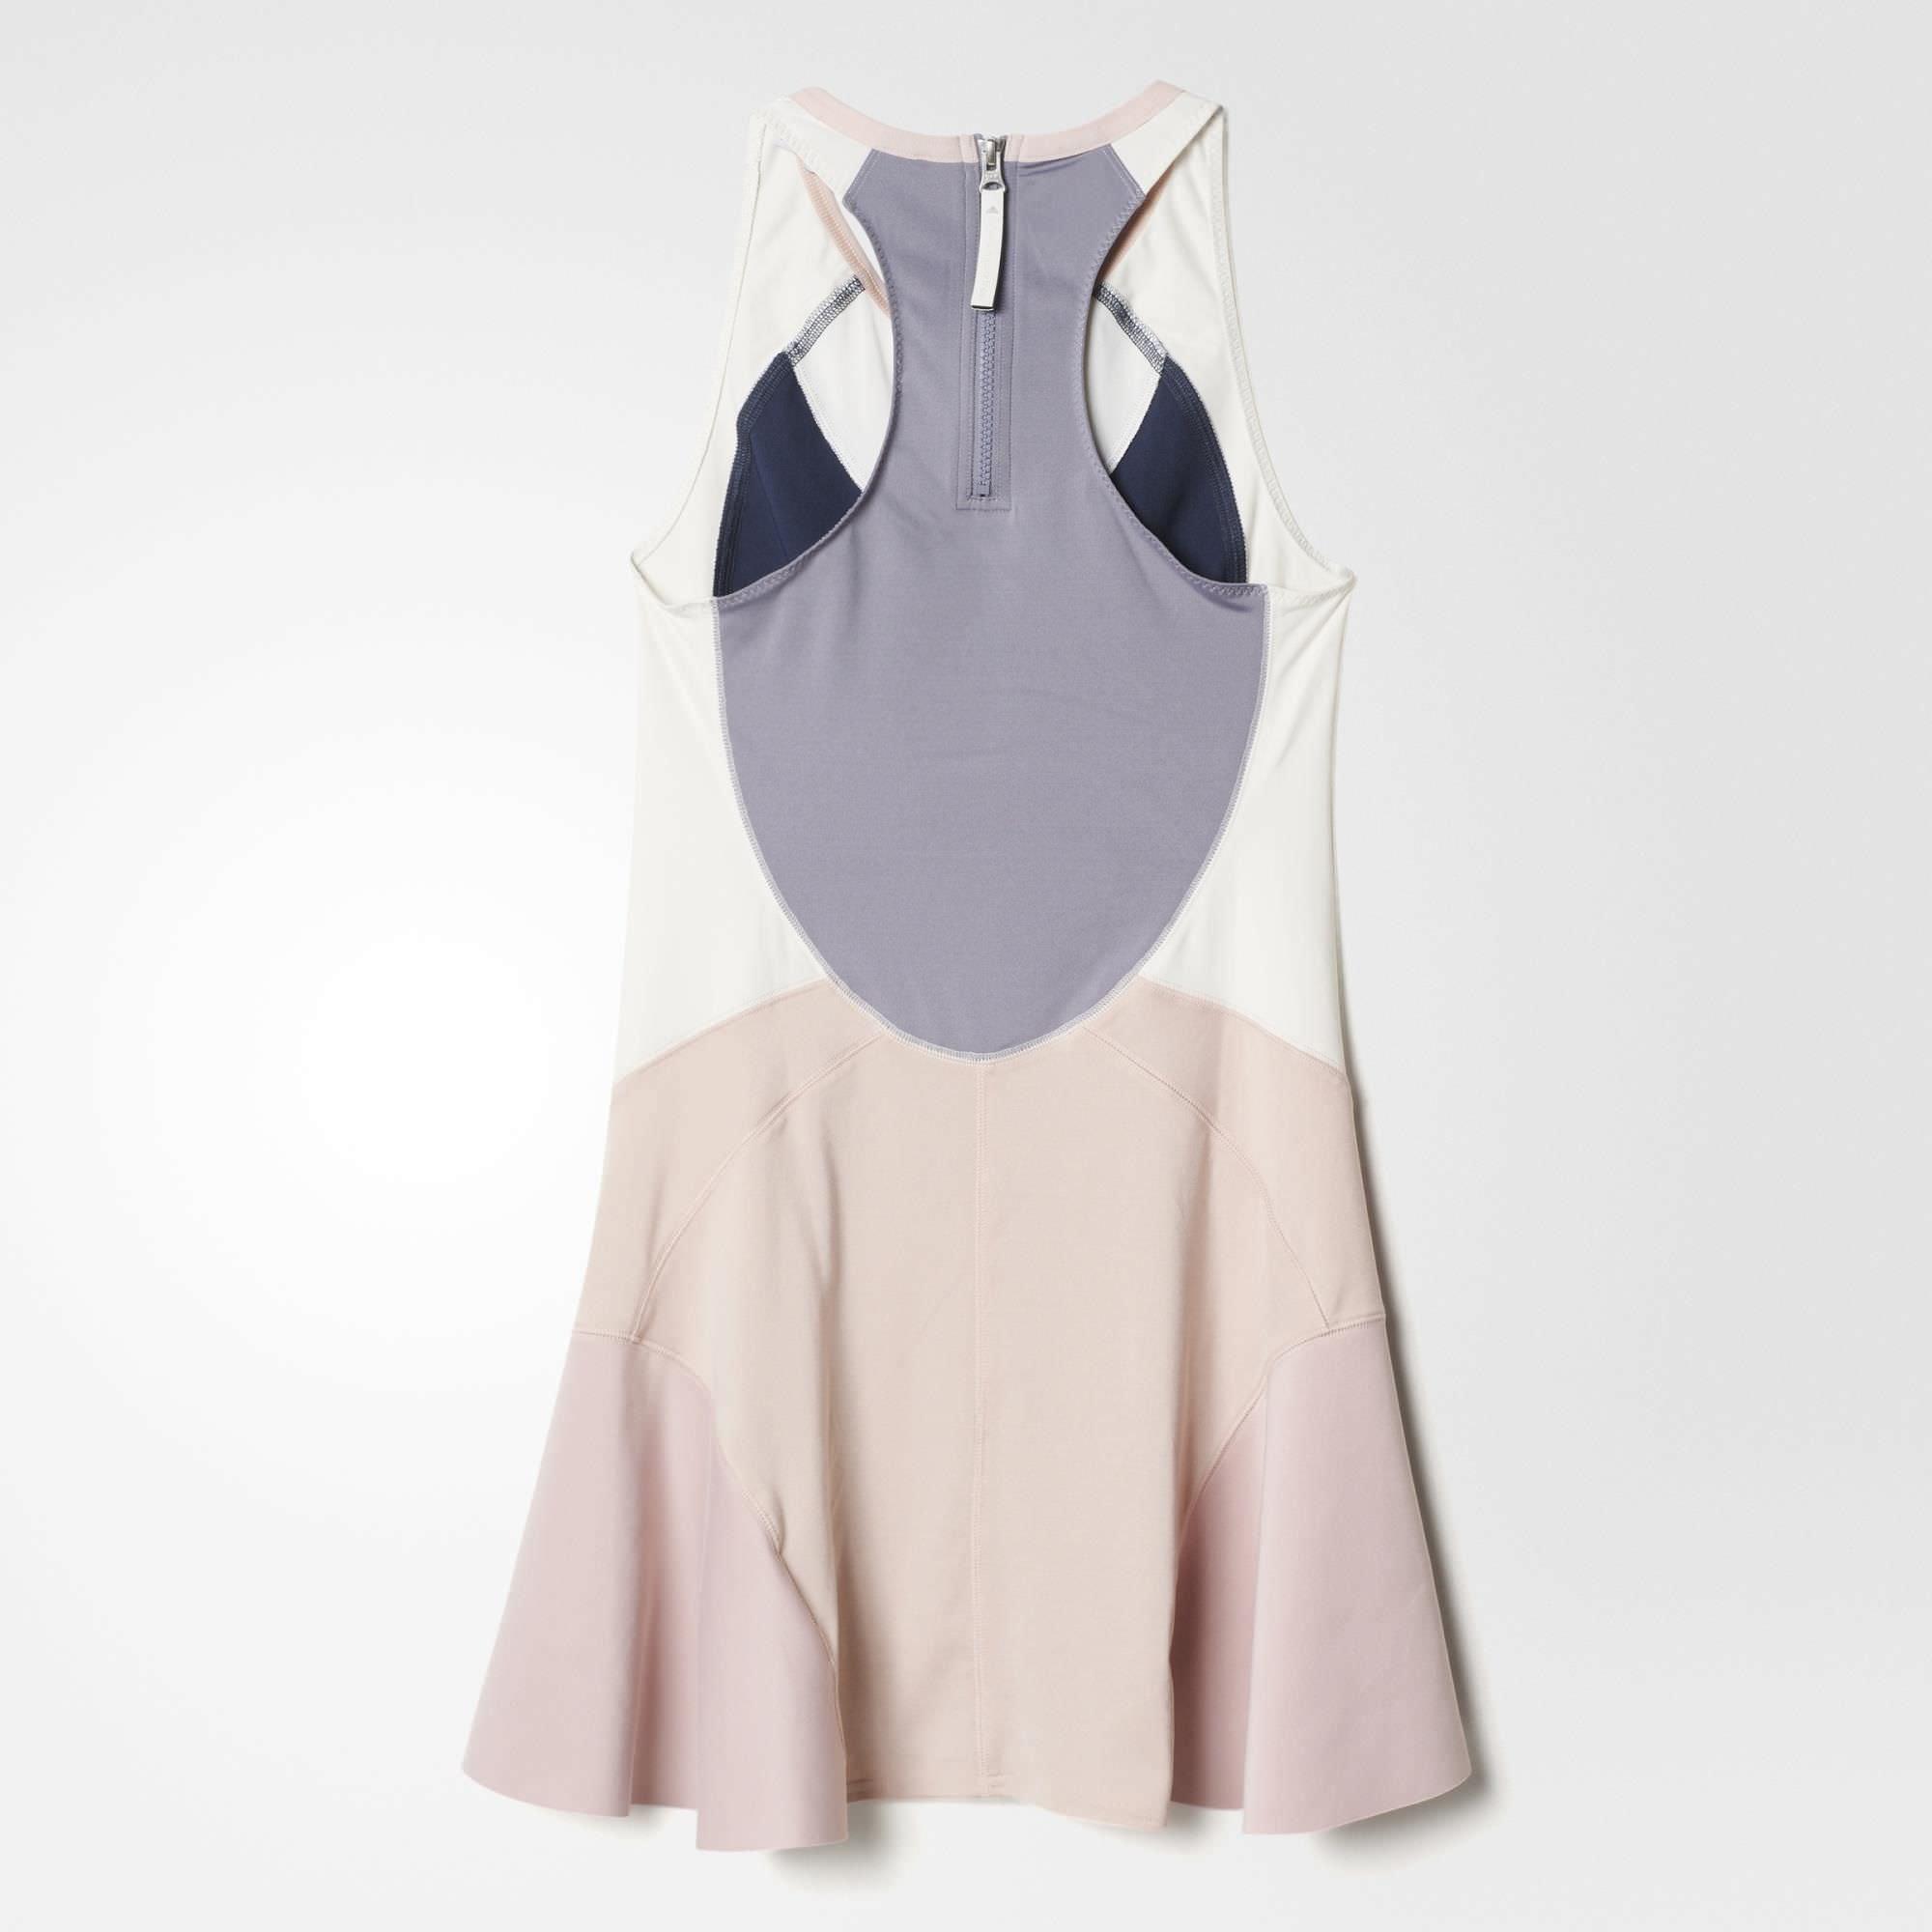 95f0427963357 Adidas Womens Stella McCartney Barricade Dress NY - Midnight Grey White